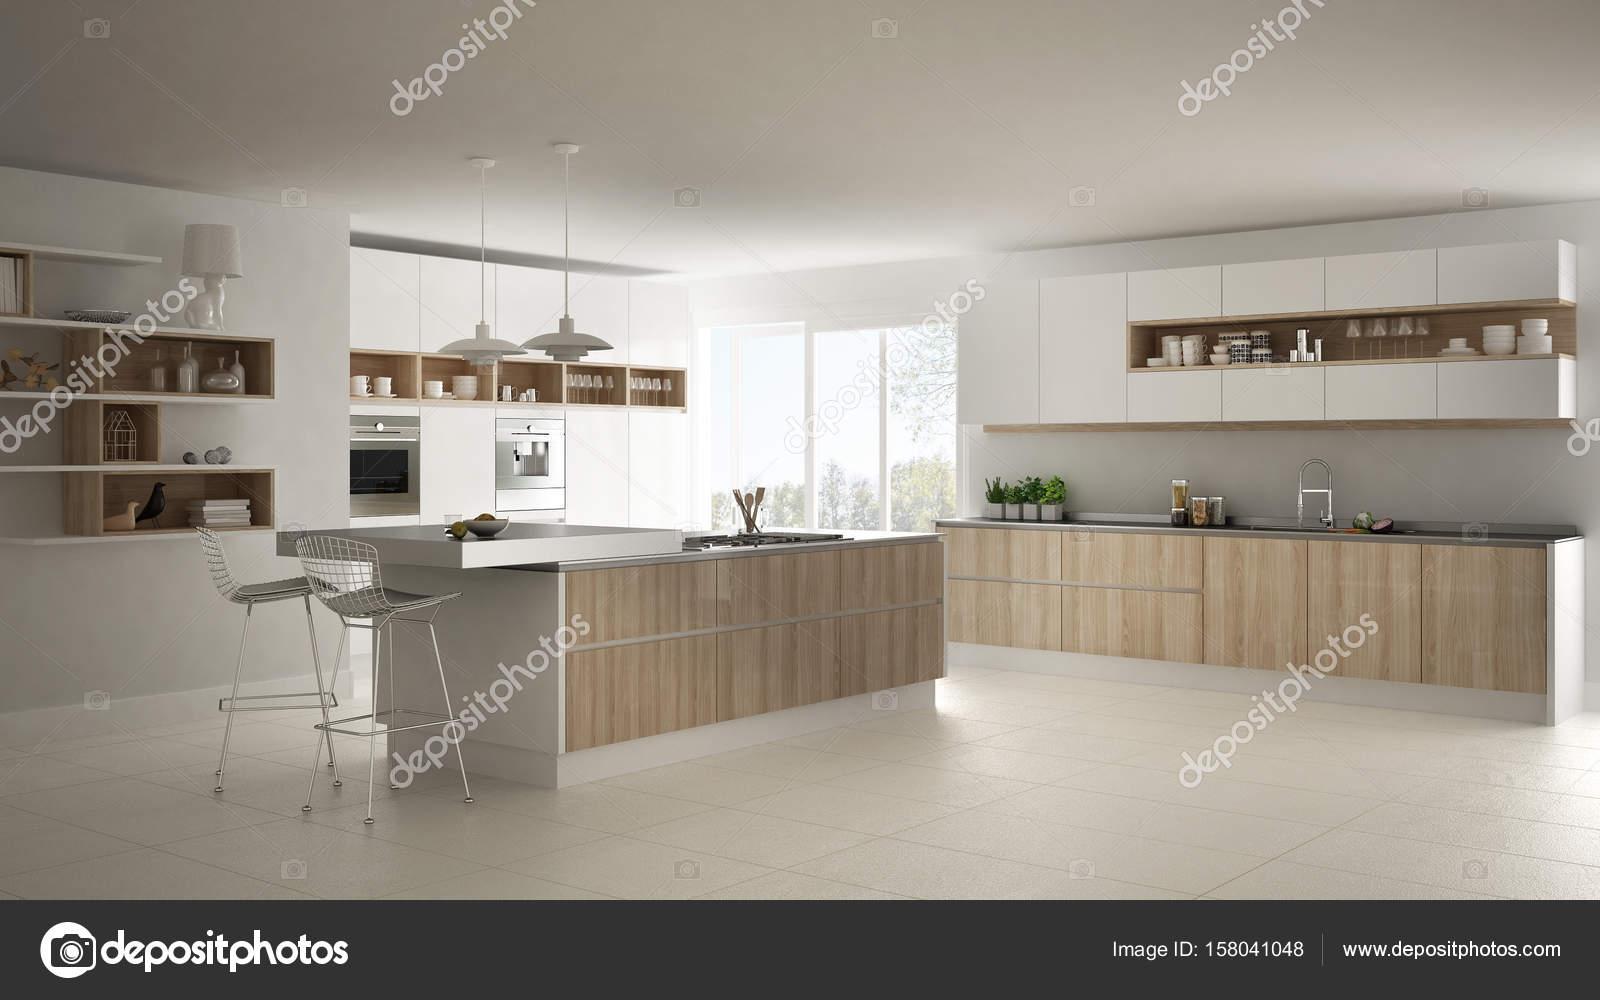 Moderne Witte Keukens : Moderne witte keuken met houten en witte details minimalistische